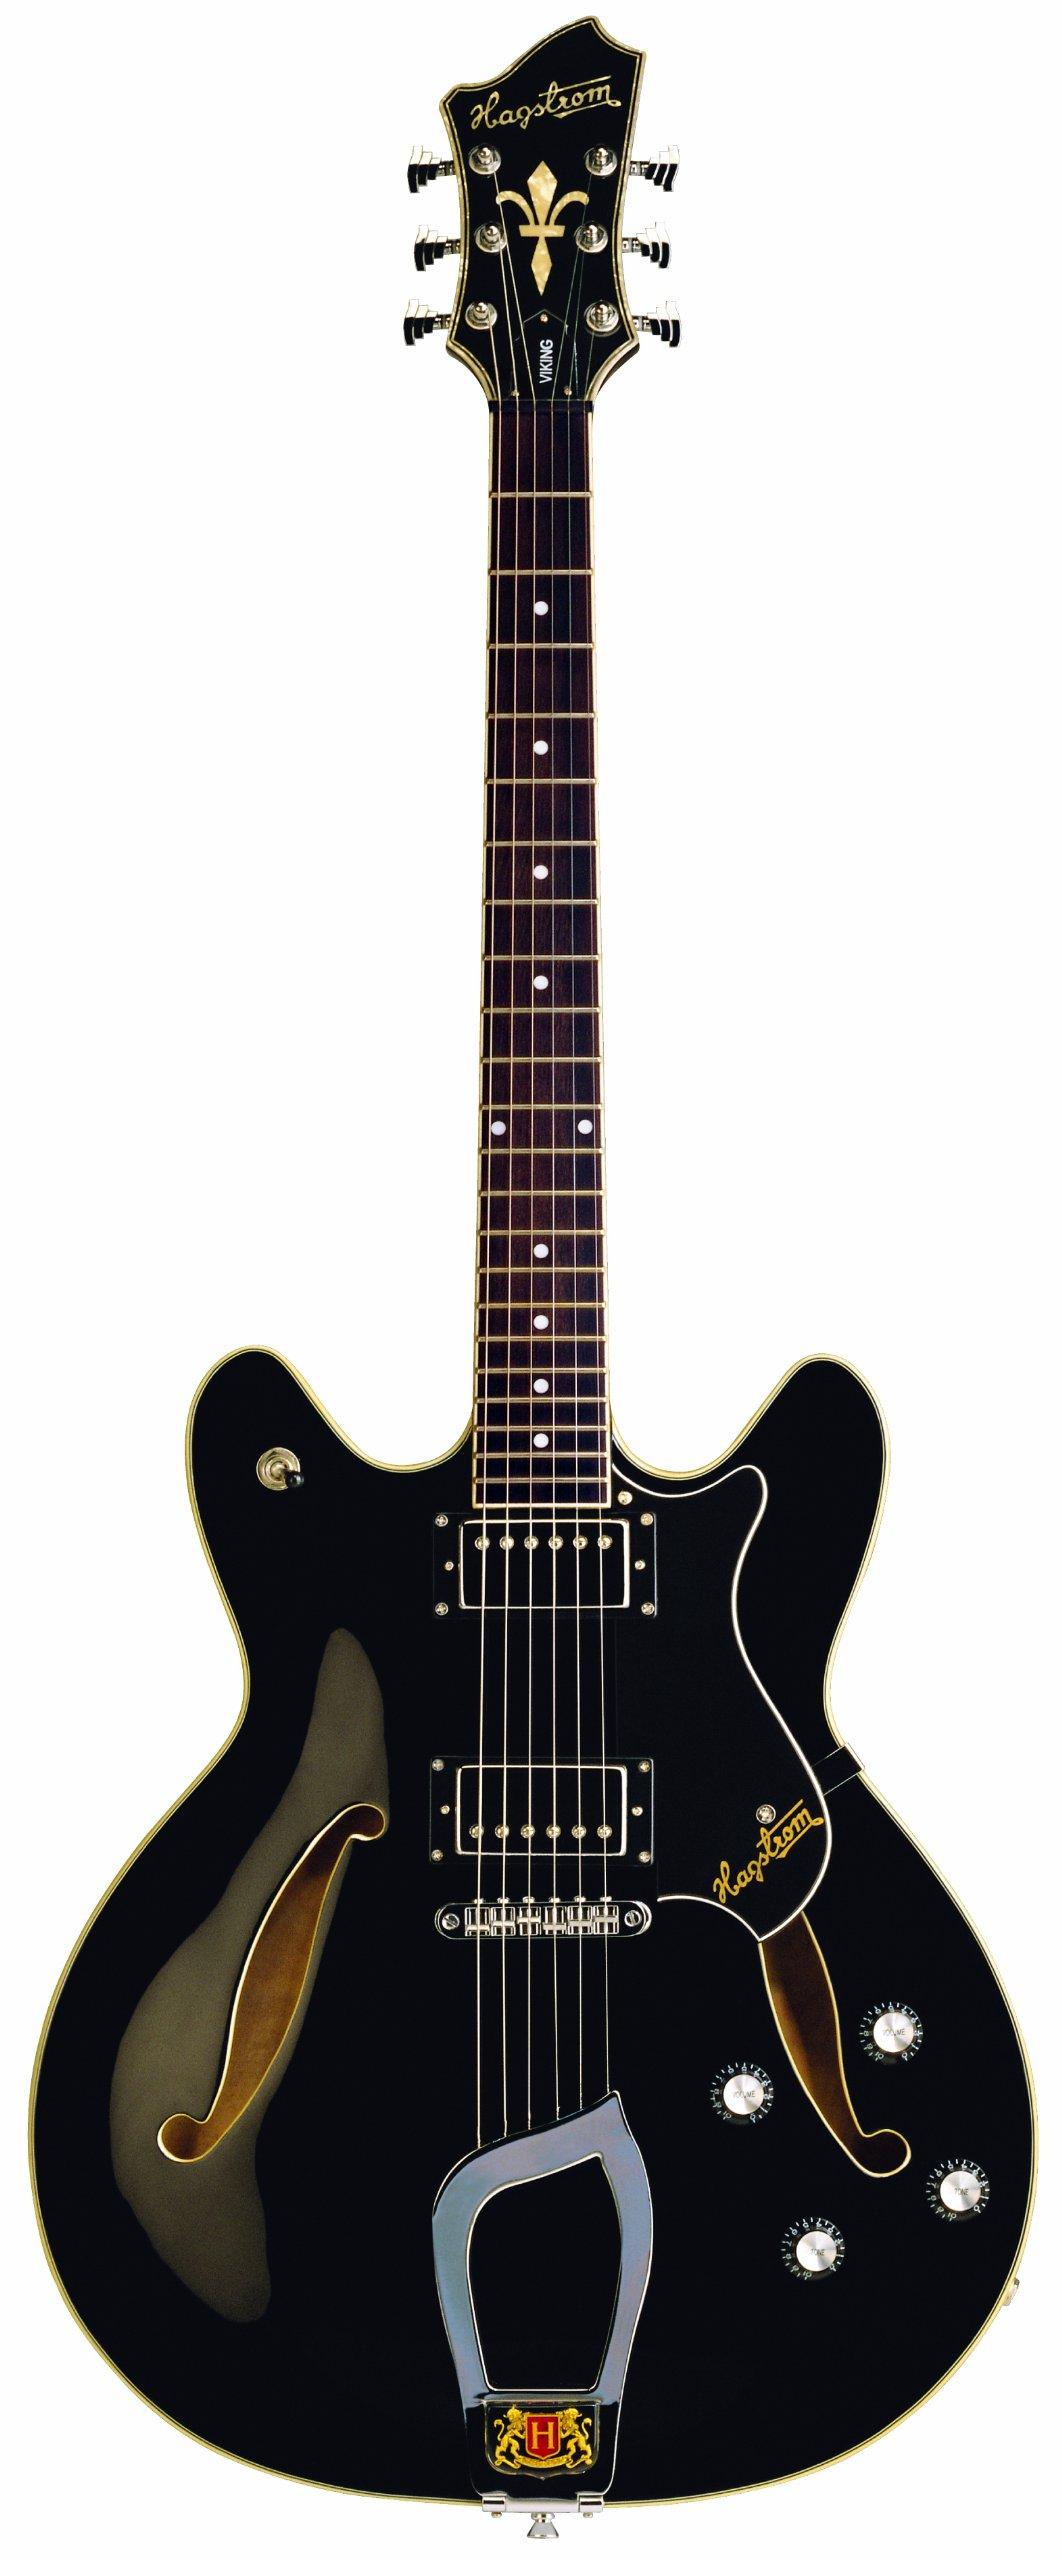 Cheap Hagstrom Viking Semi-Hollow Electric Guitar - Black Gloss Black Friday & Cyber Monday 2019